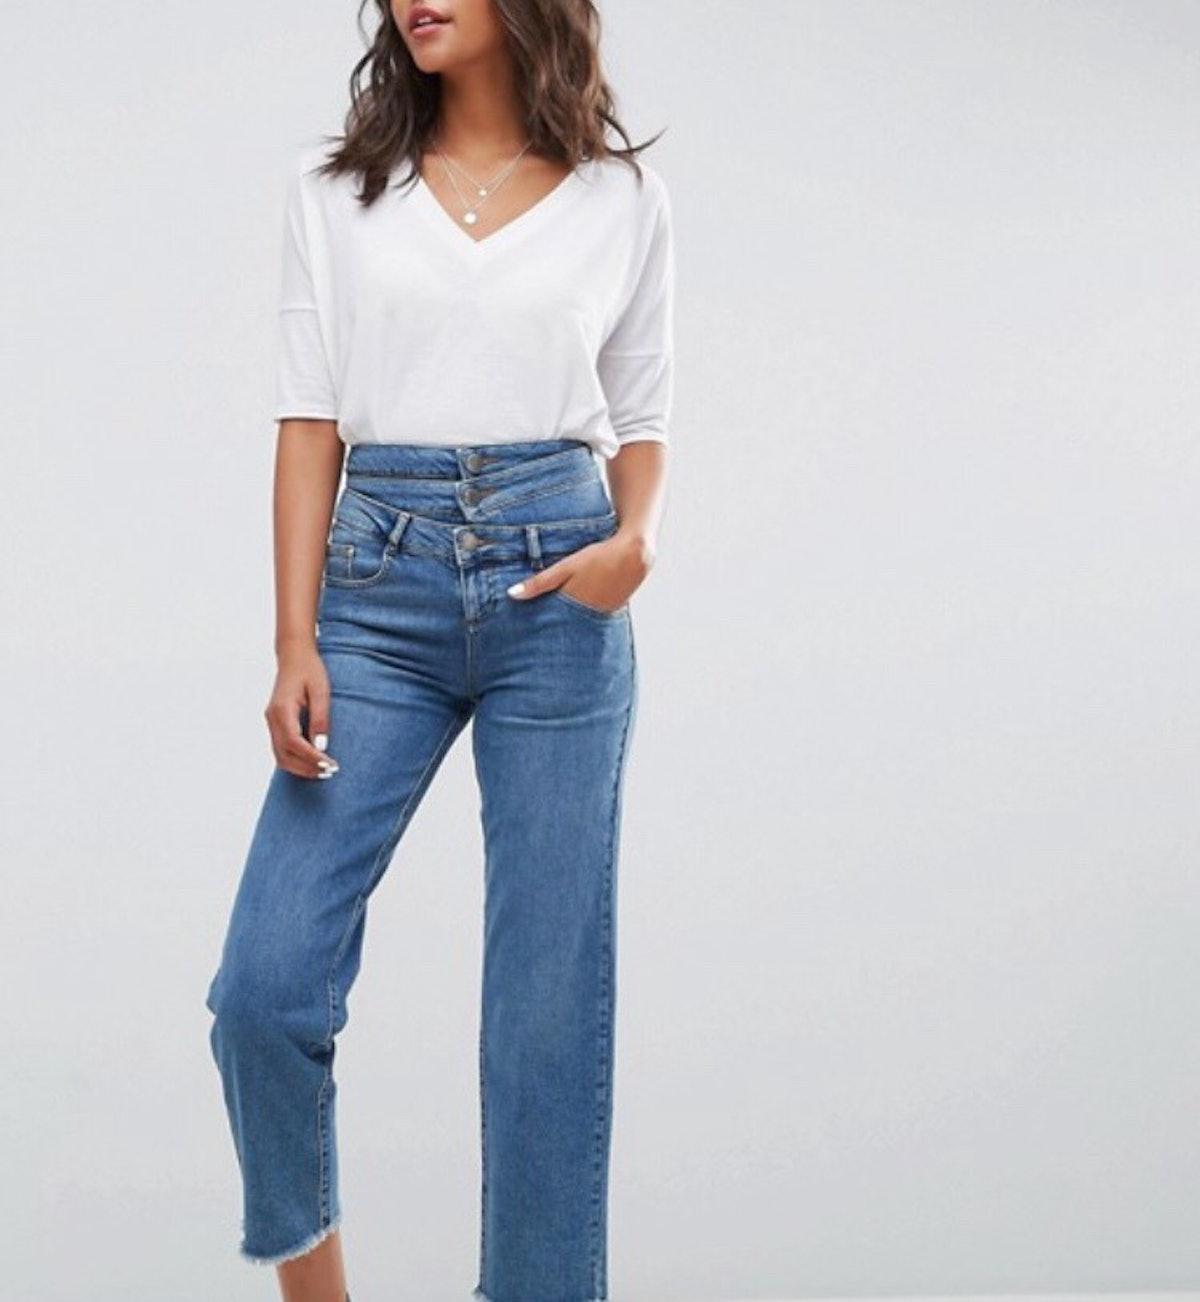 ASOS Straight Leg Triple Waistband Jean in Vogue Blue